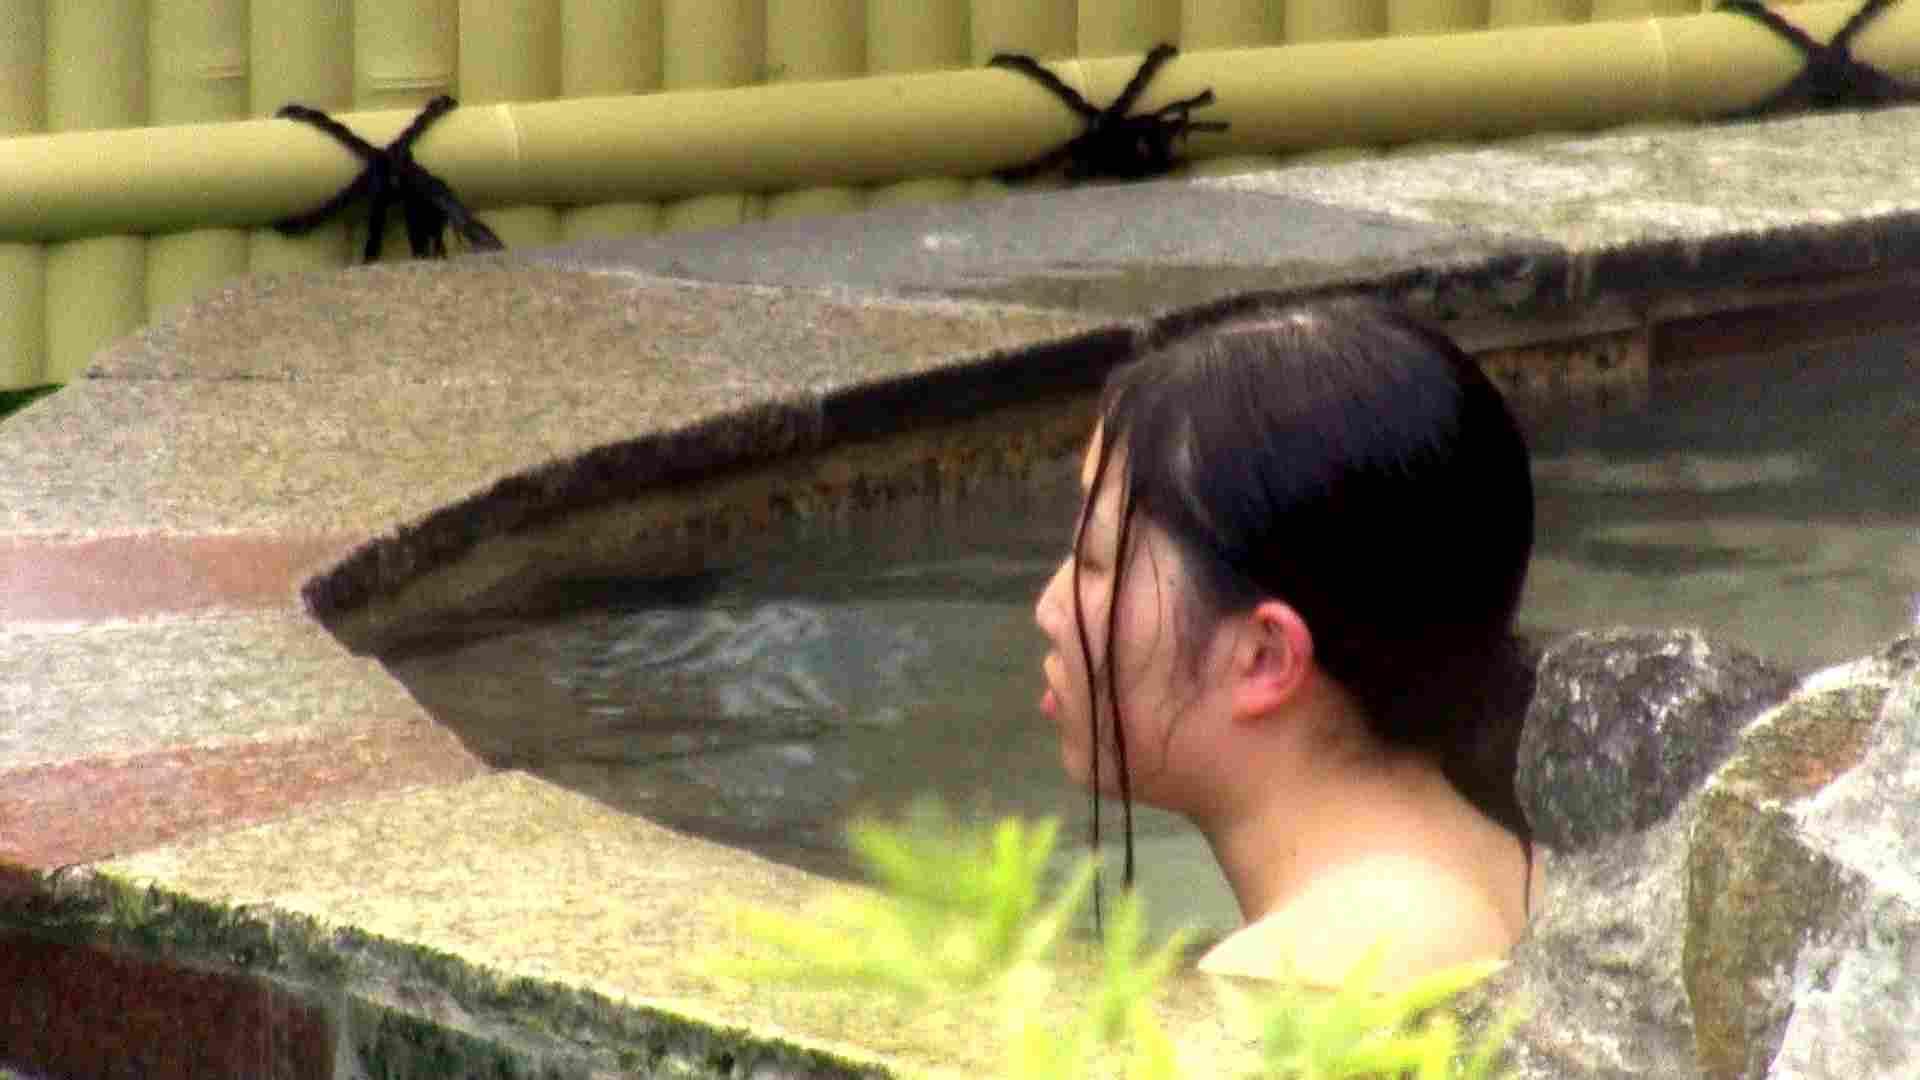 Aquaな露天風呂Vol.218 OLエロ画像 盗撮オマンコ無修正動画無料 81PICs 56